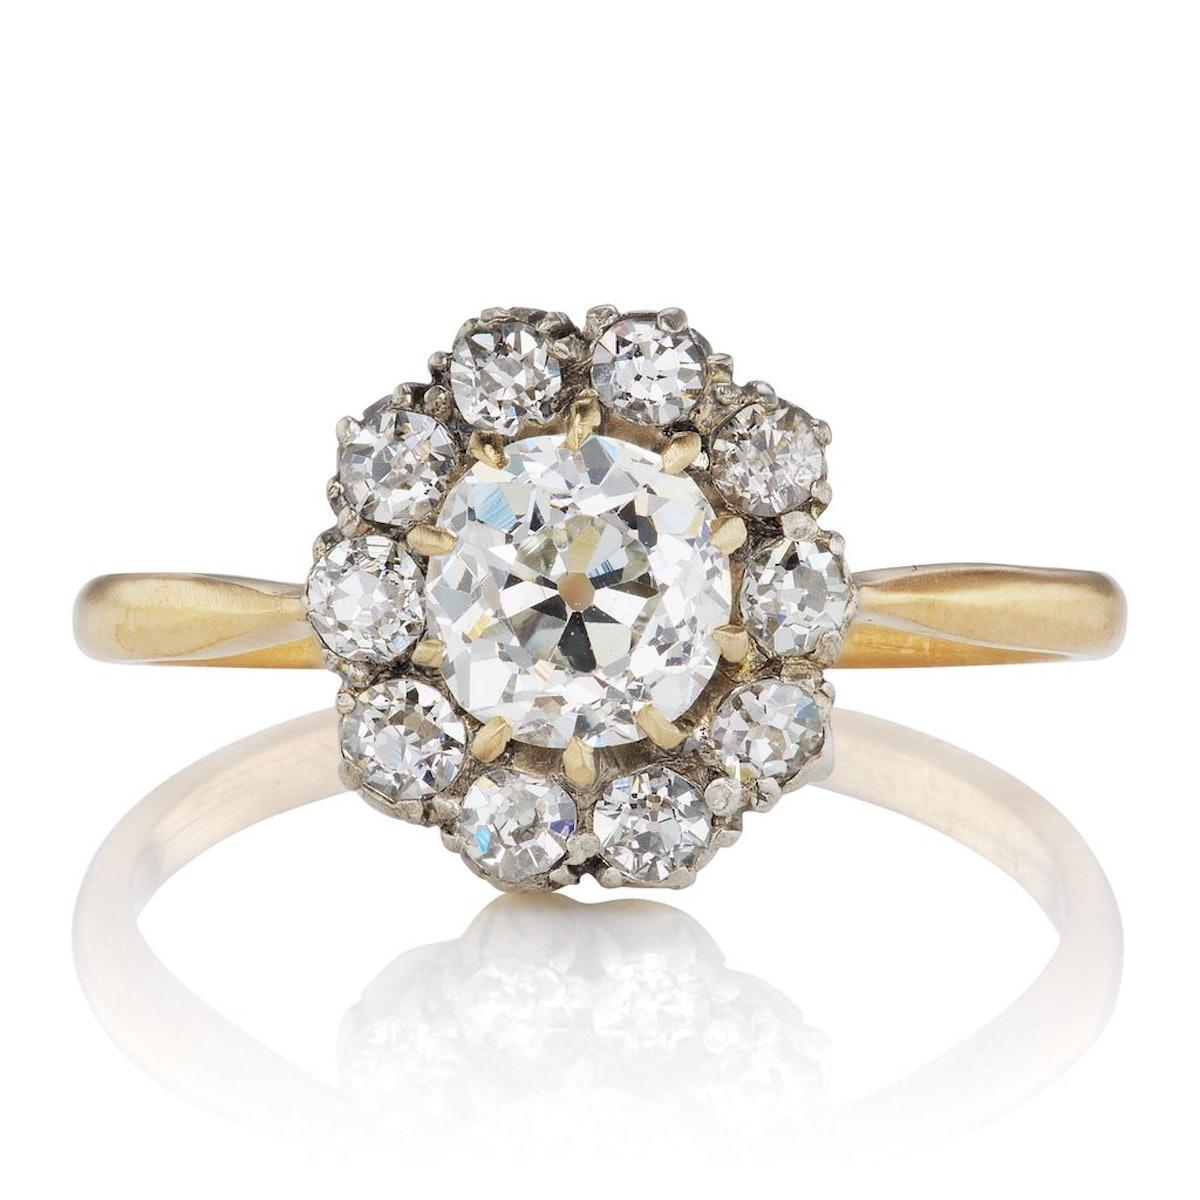 Trang Ring